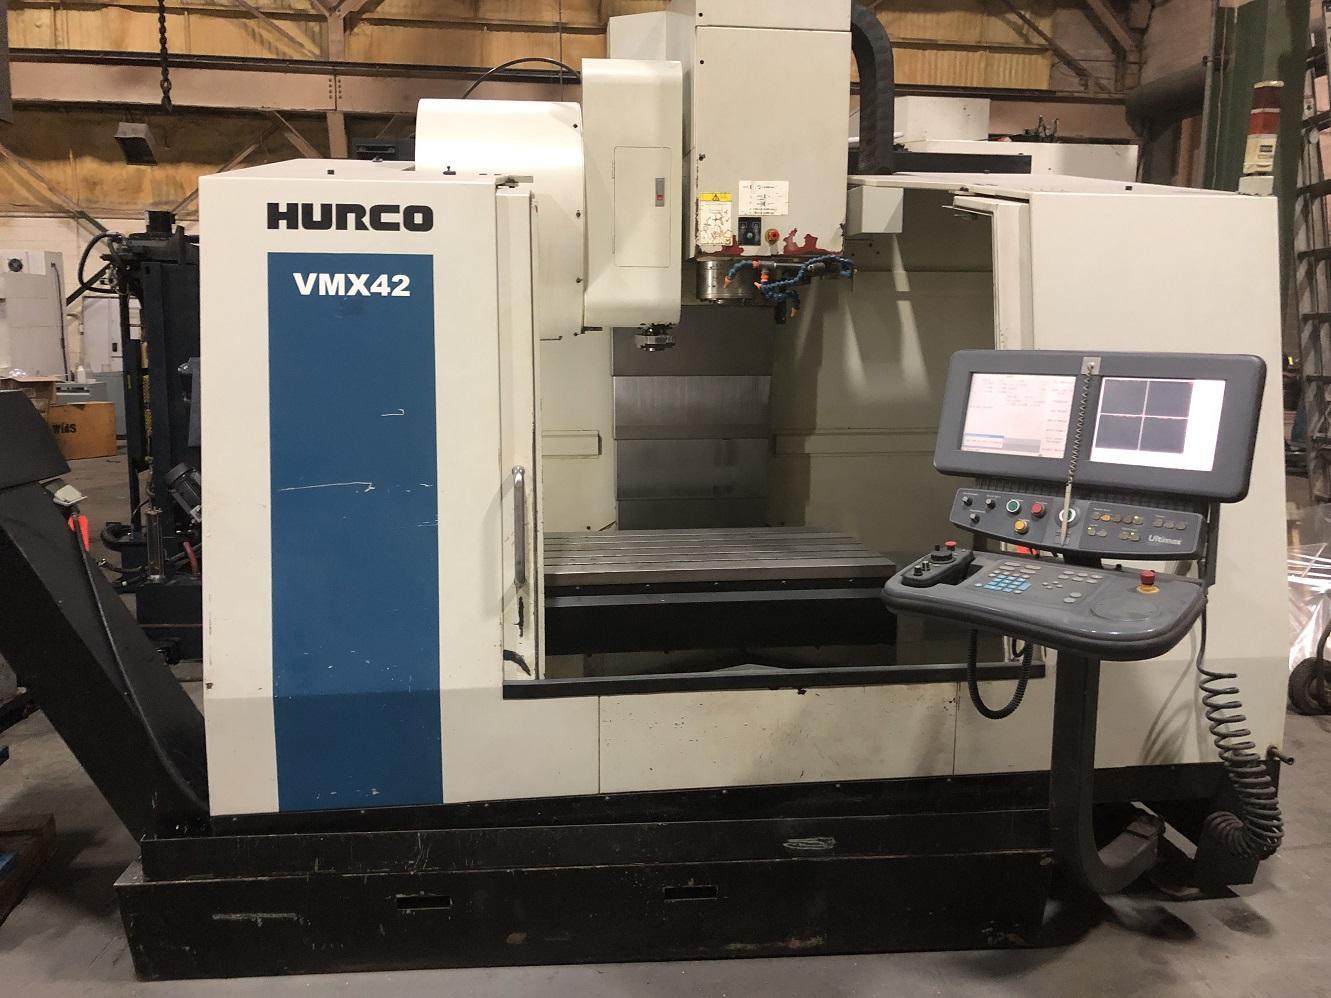 HURCO VMX 42